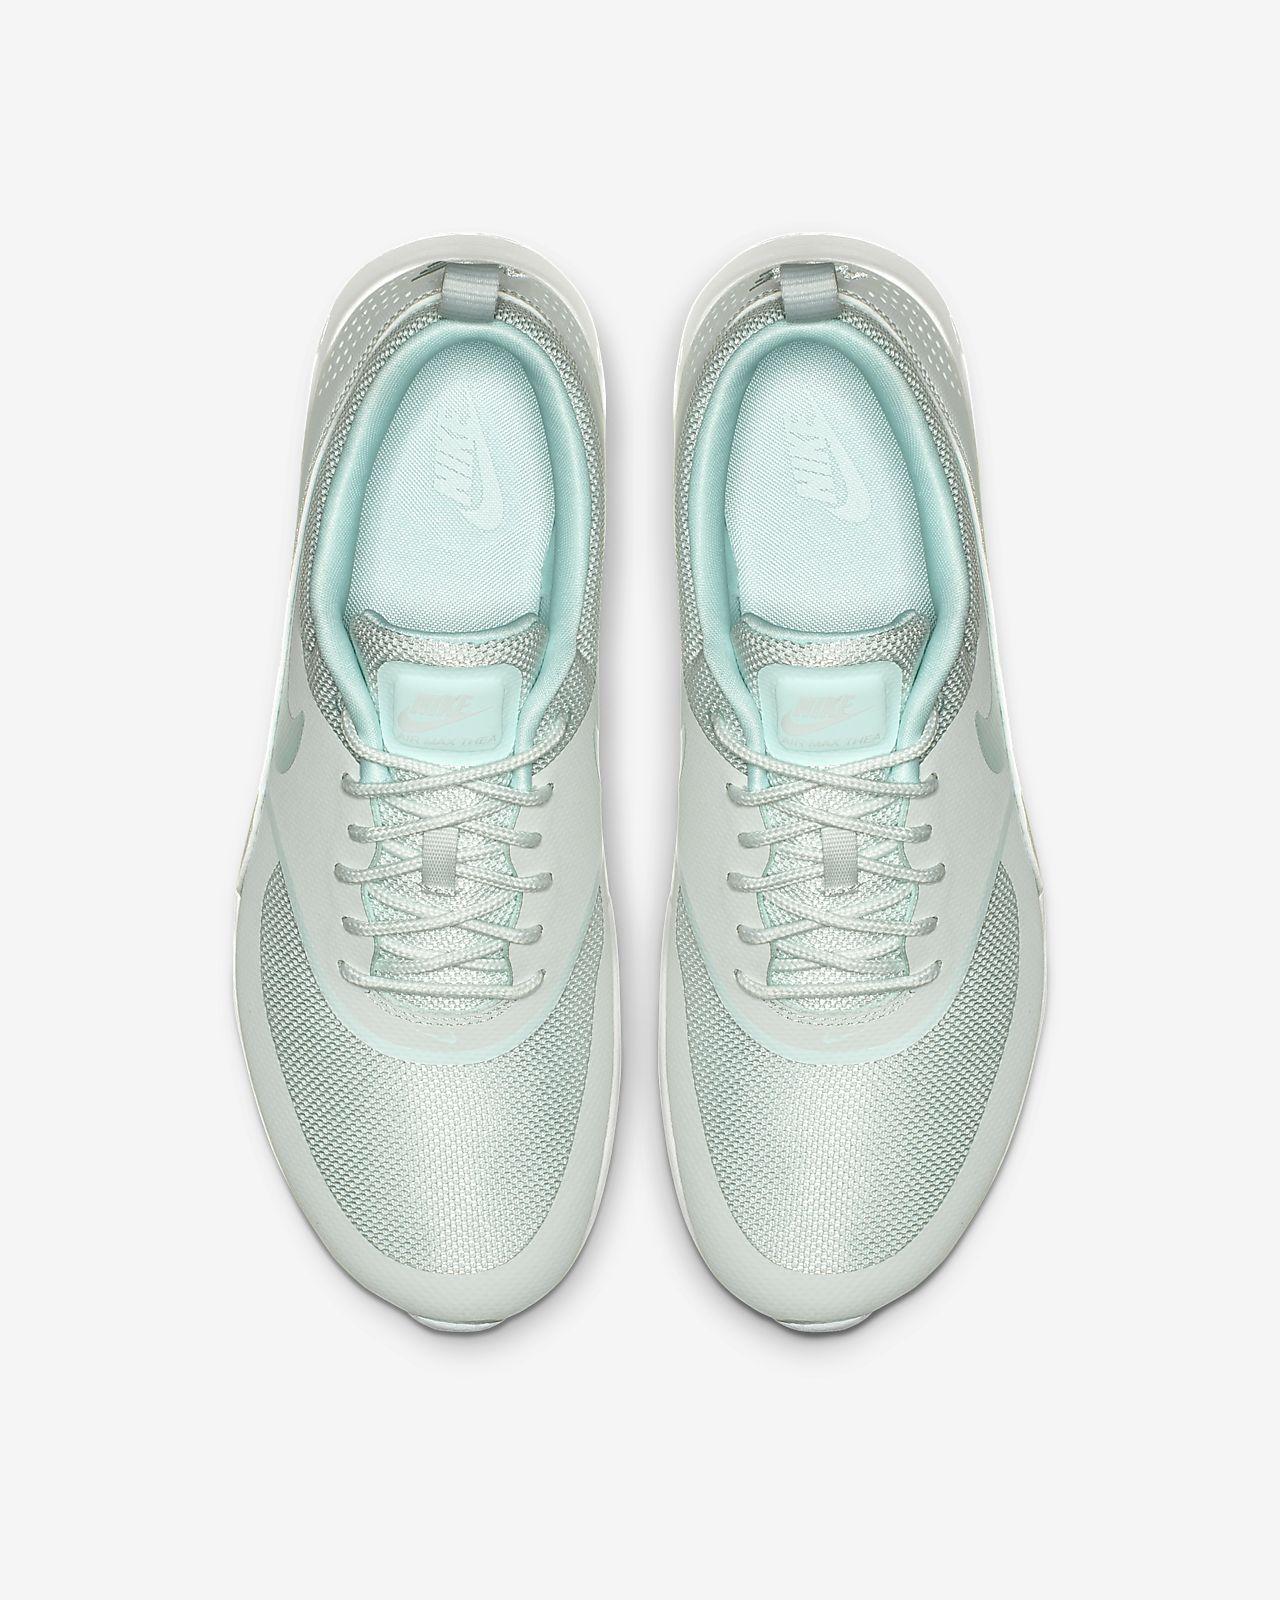 newest collection 3a732 fd78e ... Dámská bota Nike Air Max Thea